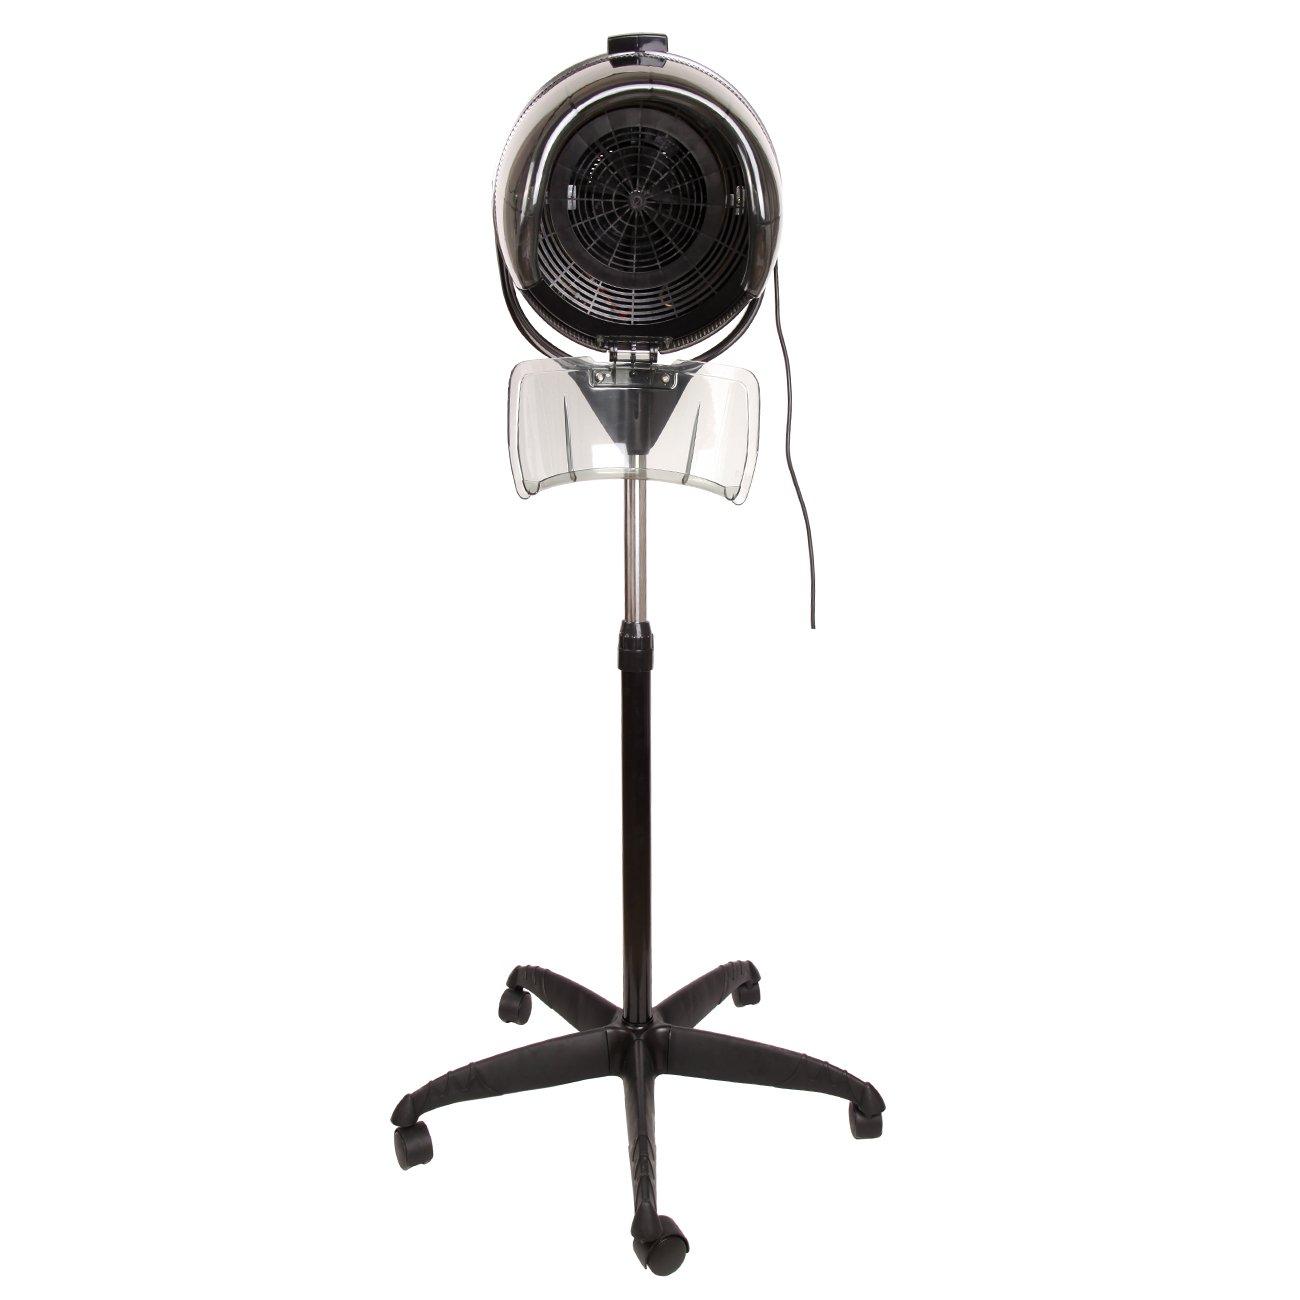 "Ridgeyard 30""-50"" Height Adjustable 900W Professional Salon Beauty Hair Dryer Floor Bonnet Hood with Rolling Base Wheels"